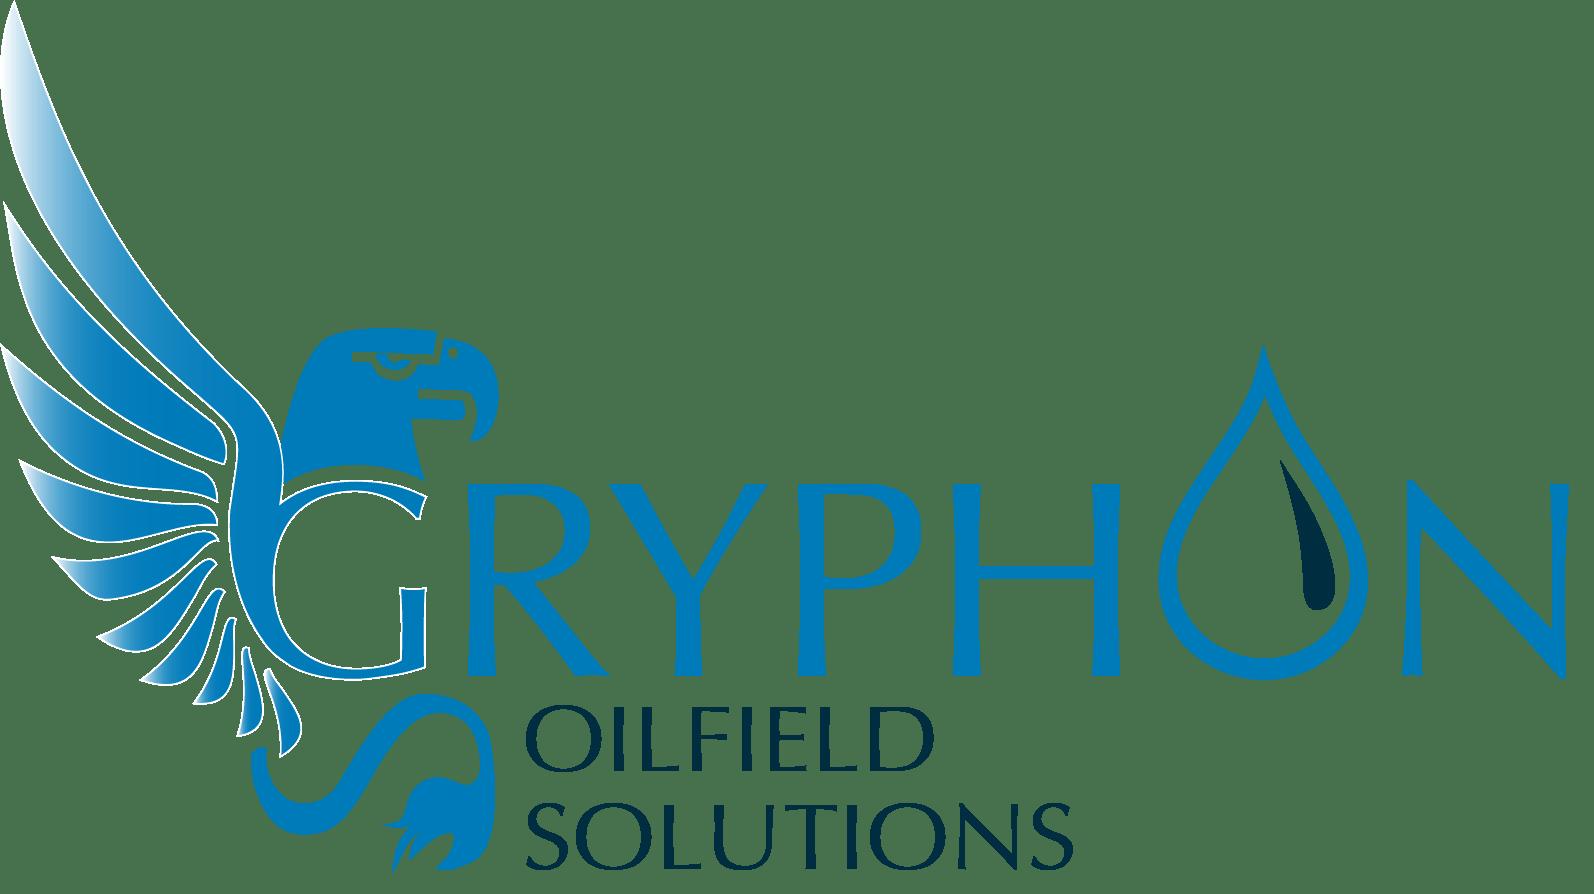 Gryphon Oilfield Solutions company logo